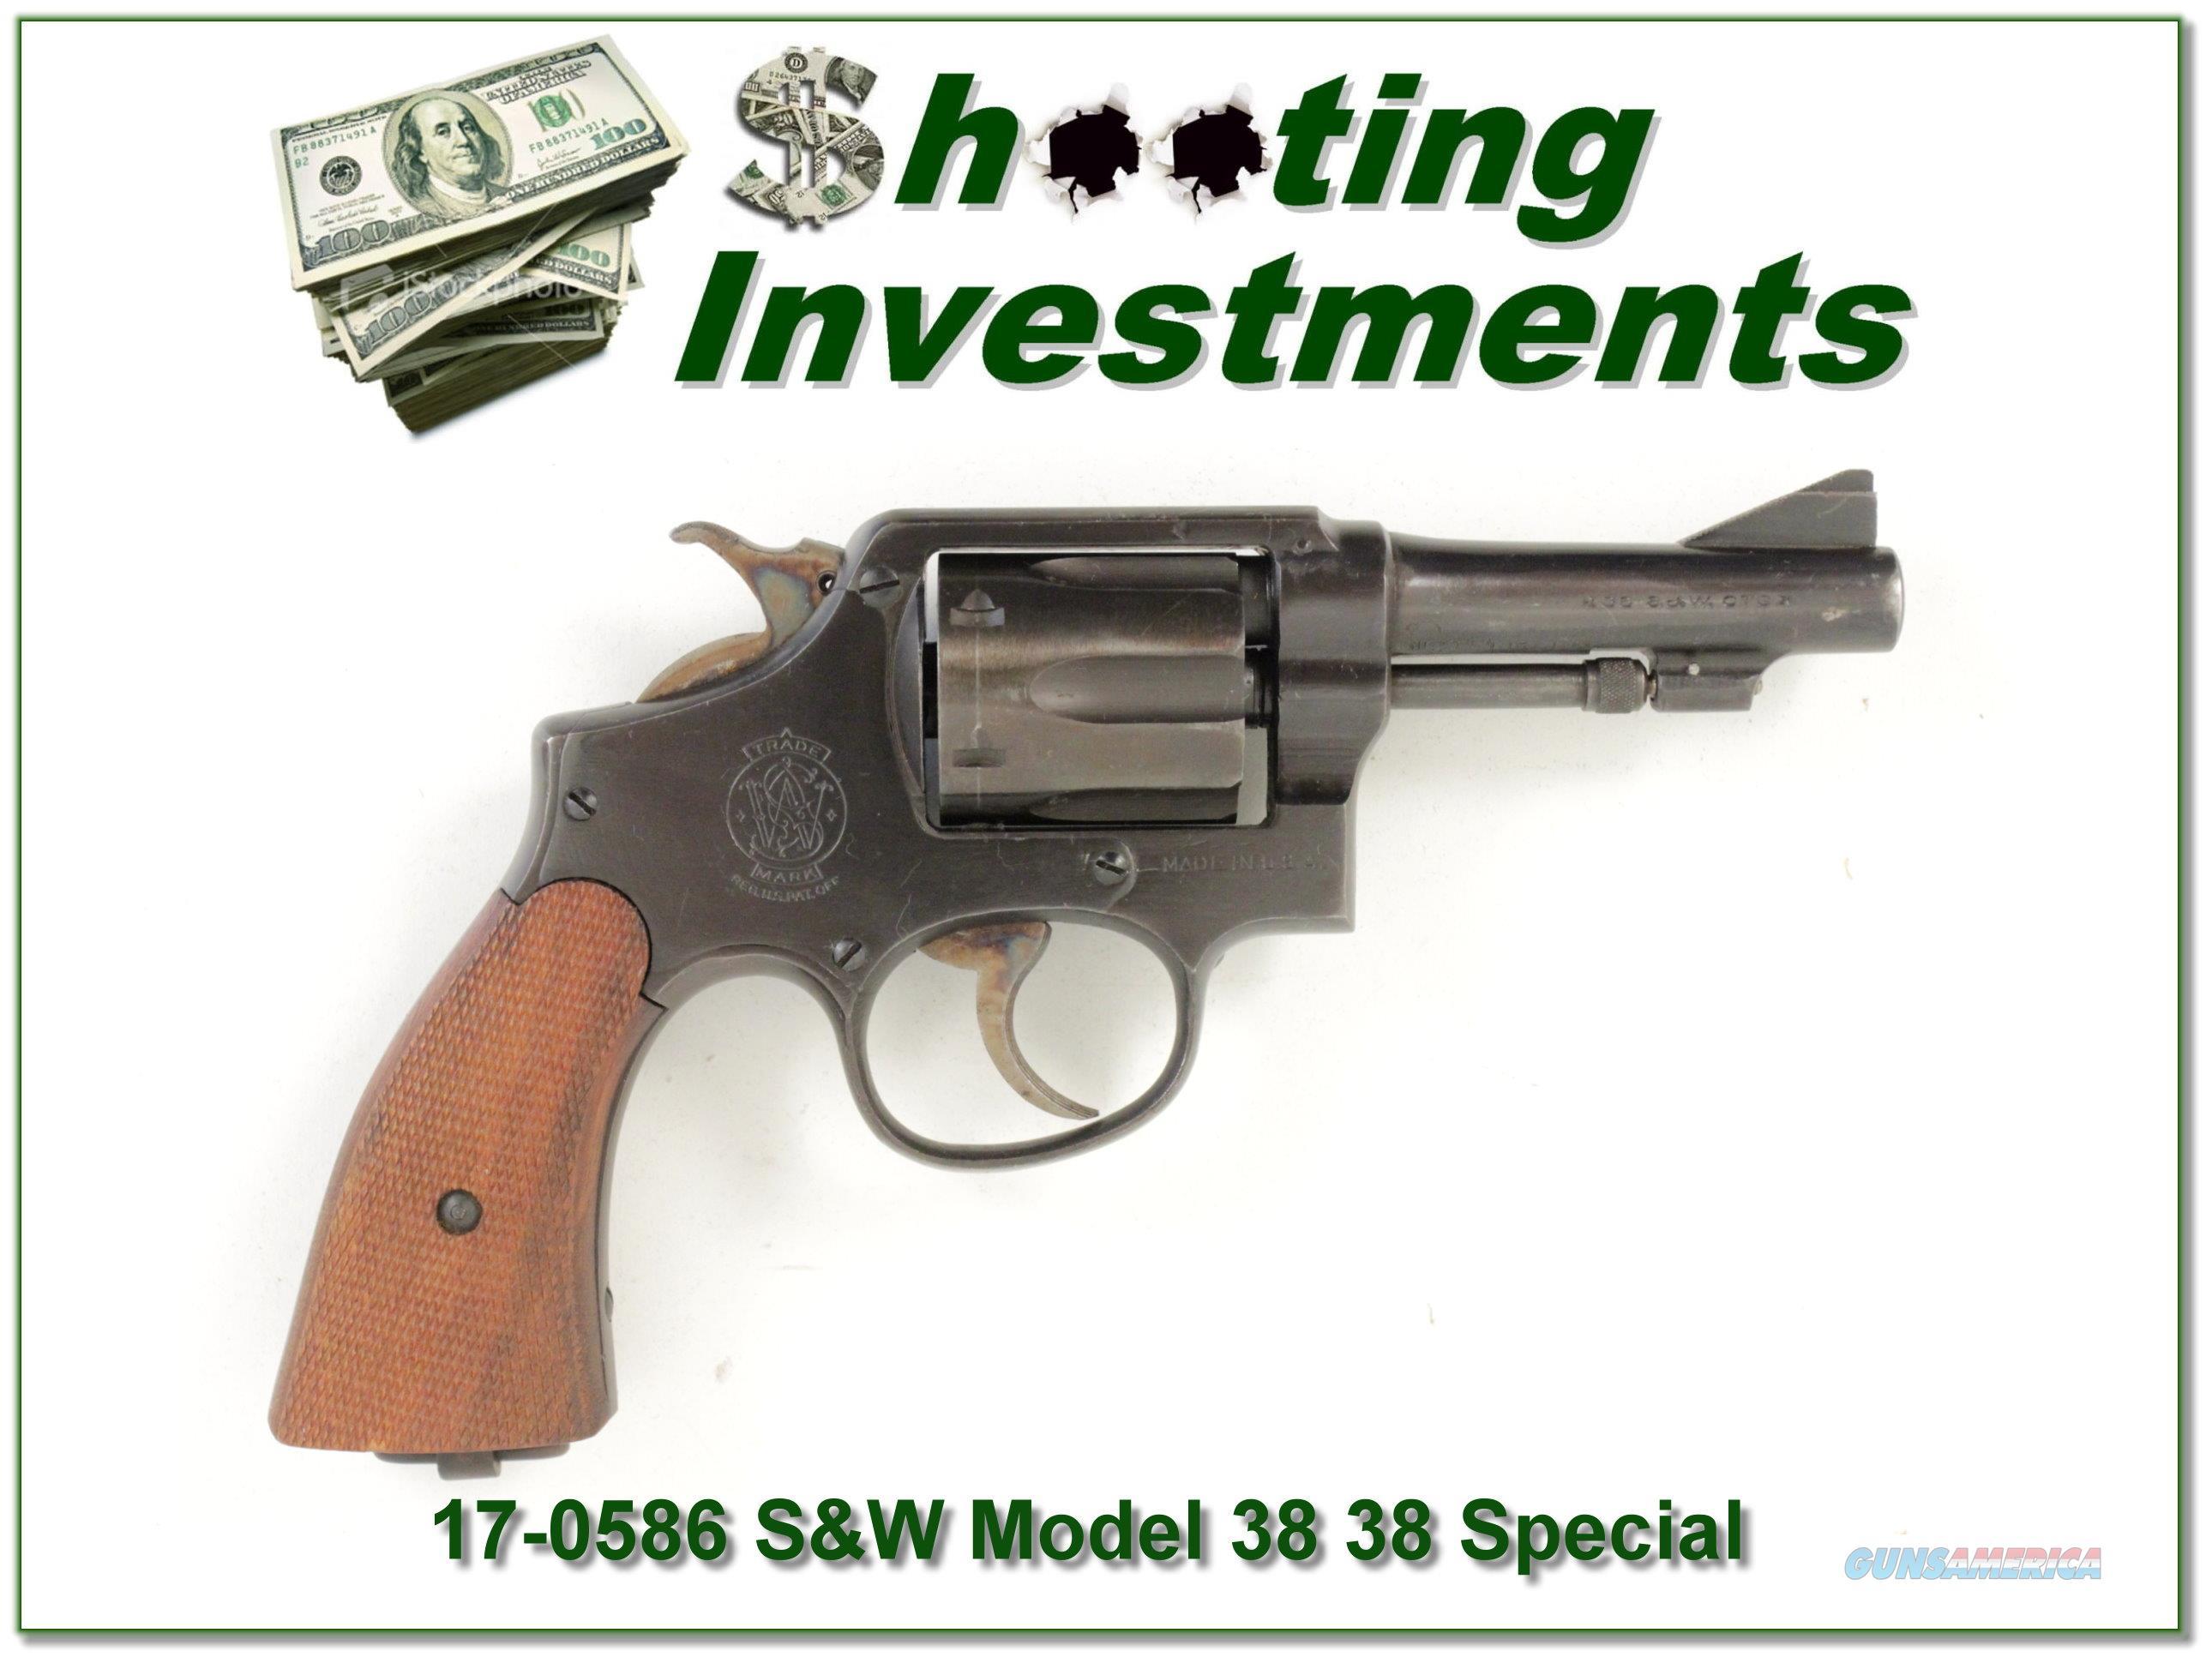 Smith & Wesson Victory 38 / 200 British Service Revolver  Guns > Pistols > Smith & Wesson Revolvers > Full Frame Revolver